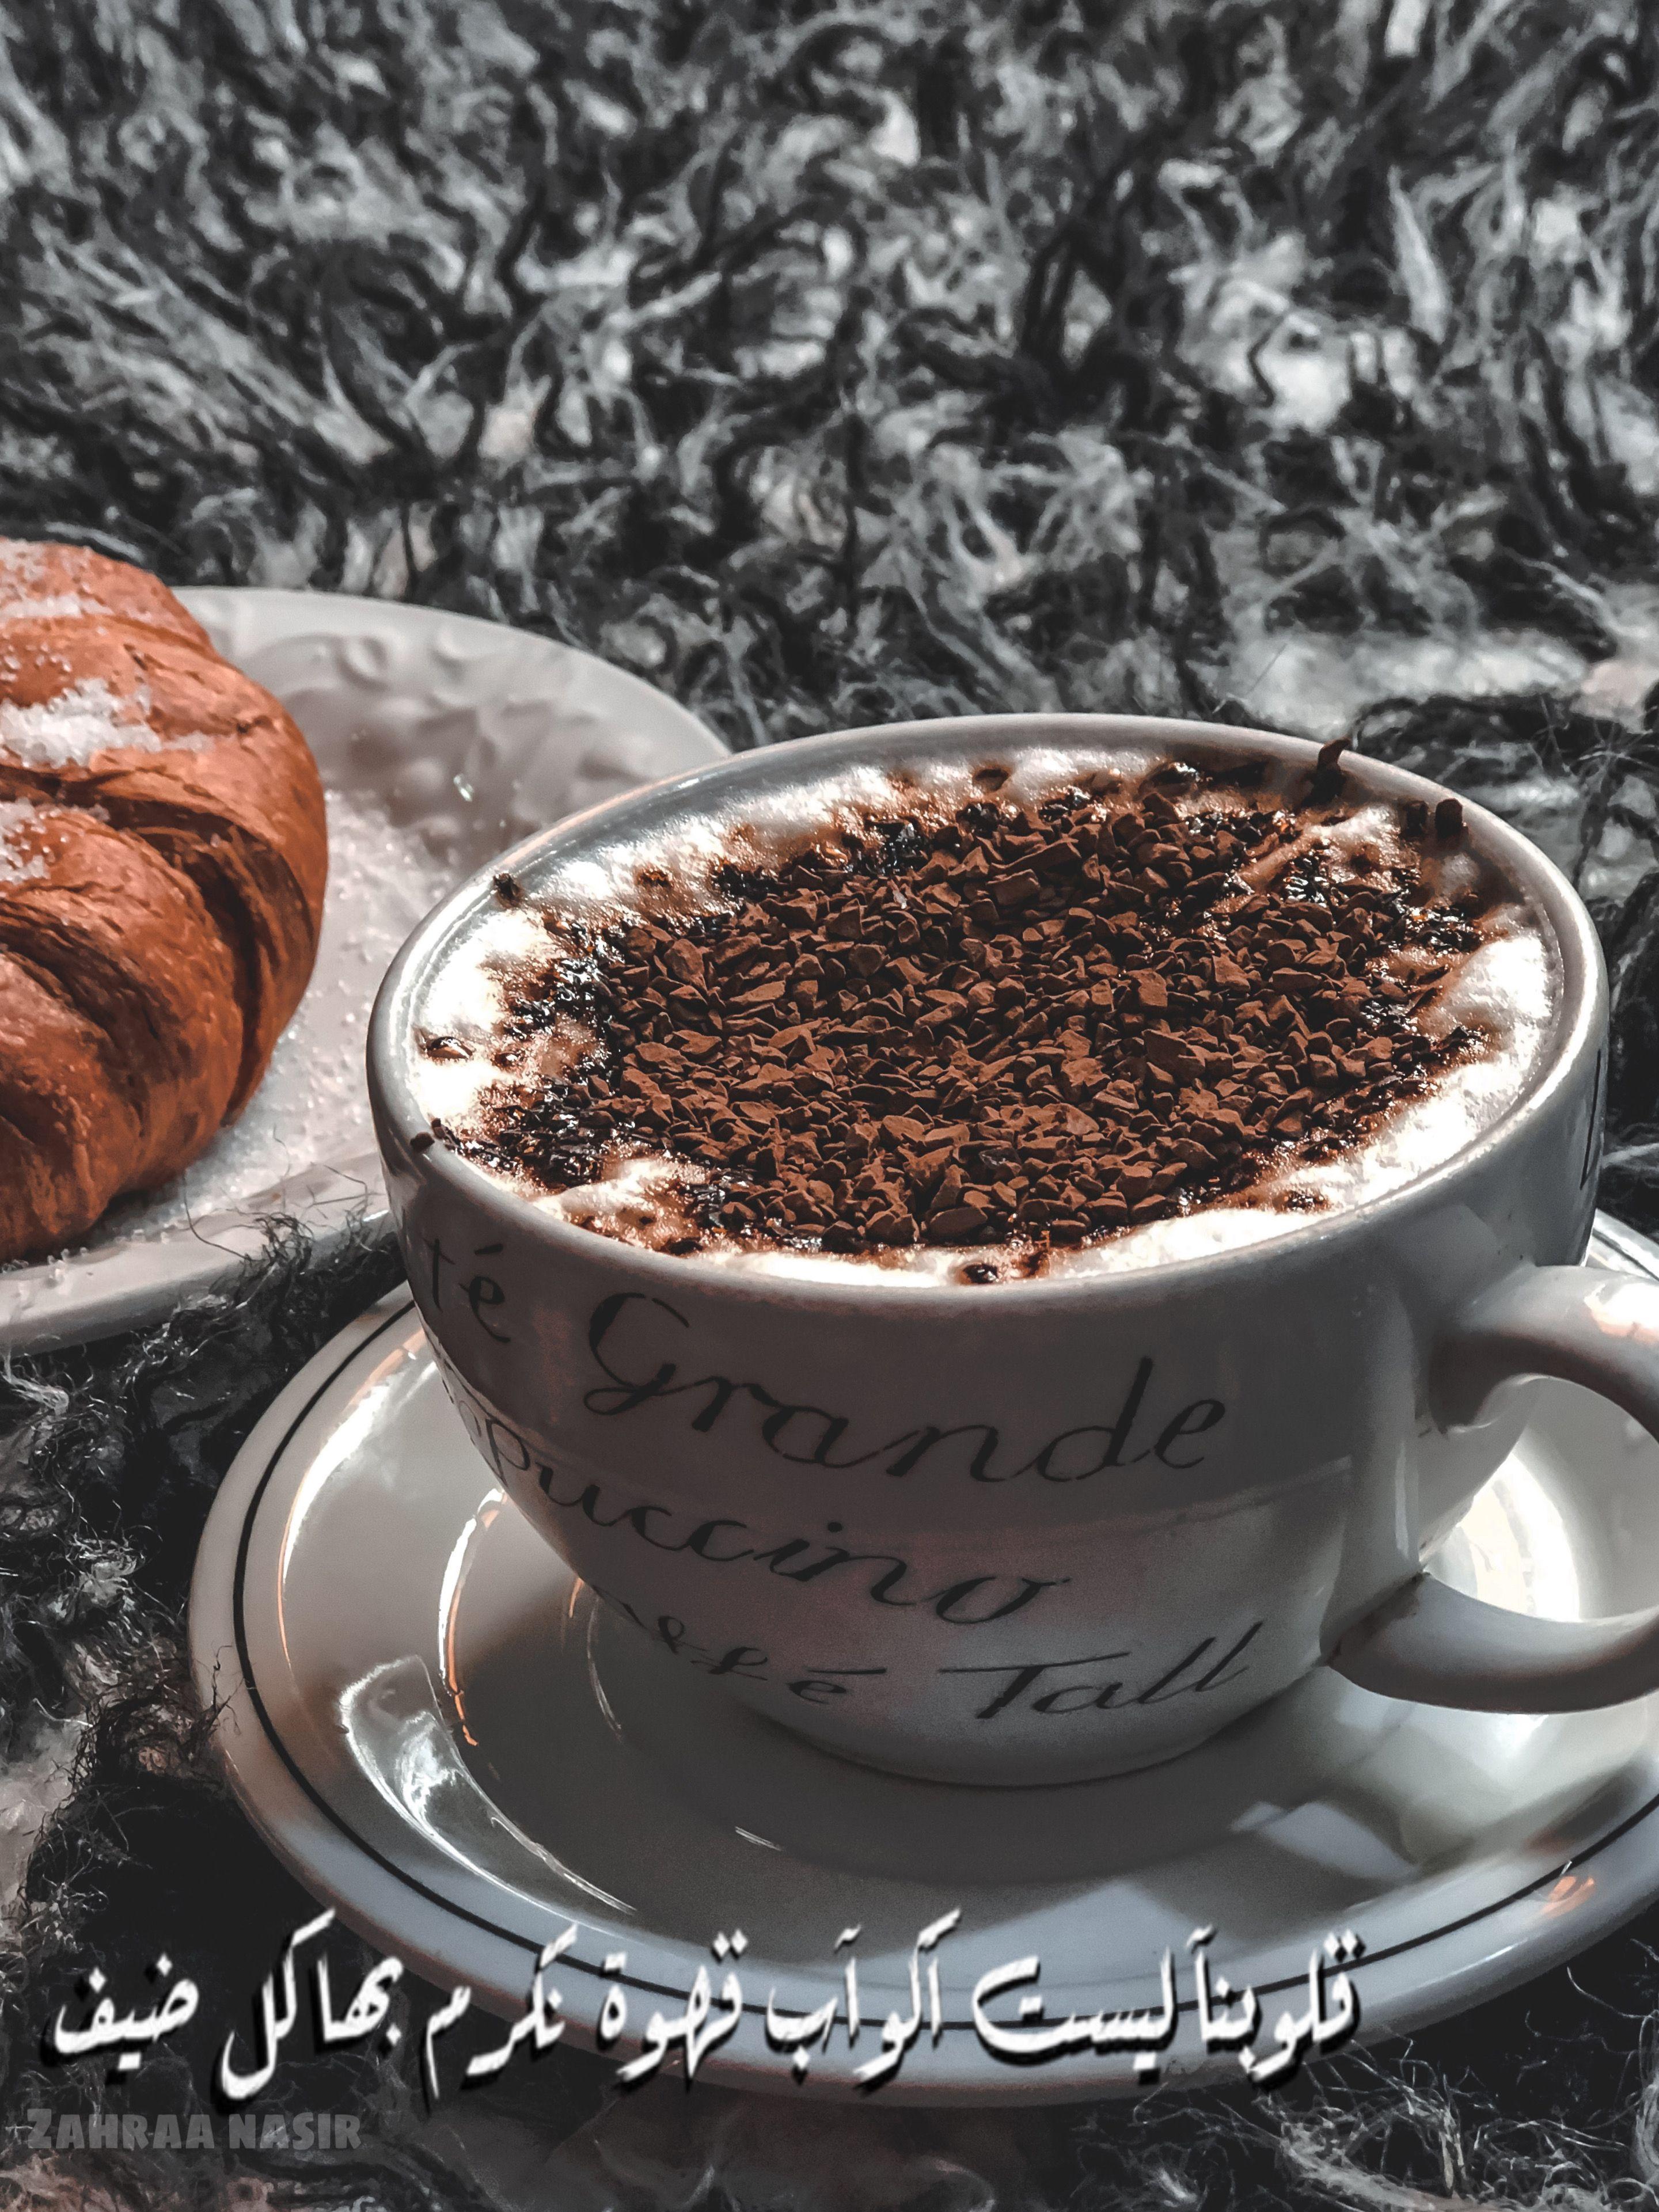 احب القهووه Cafe Interior Design Coffee Tableware